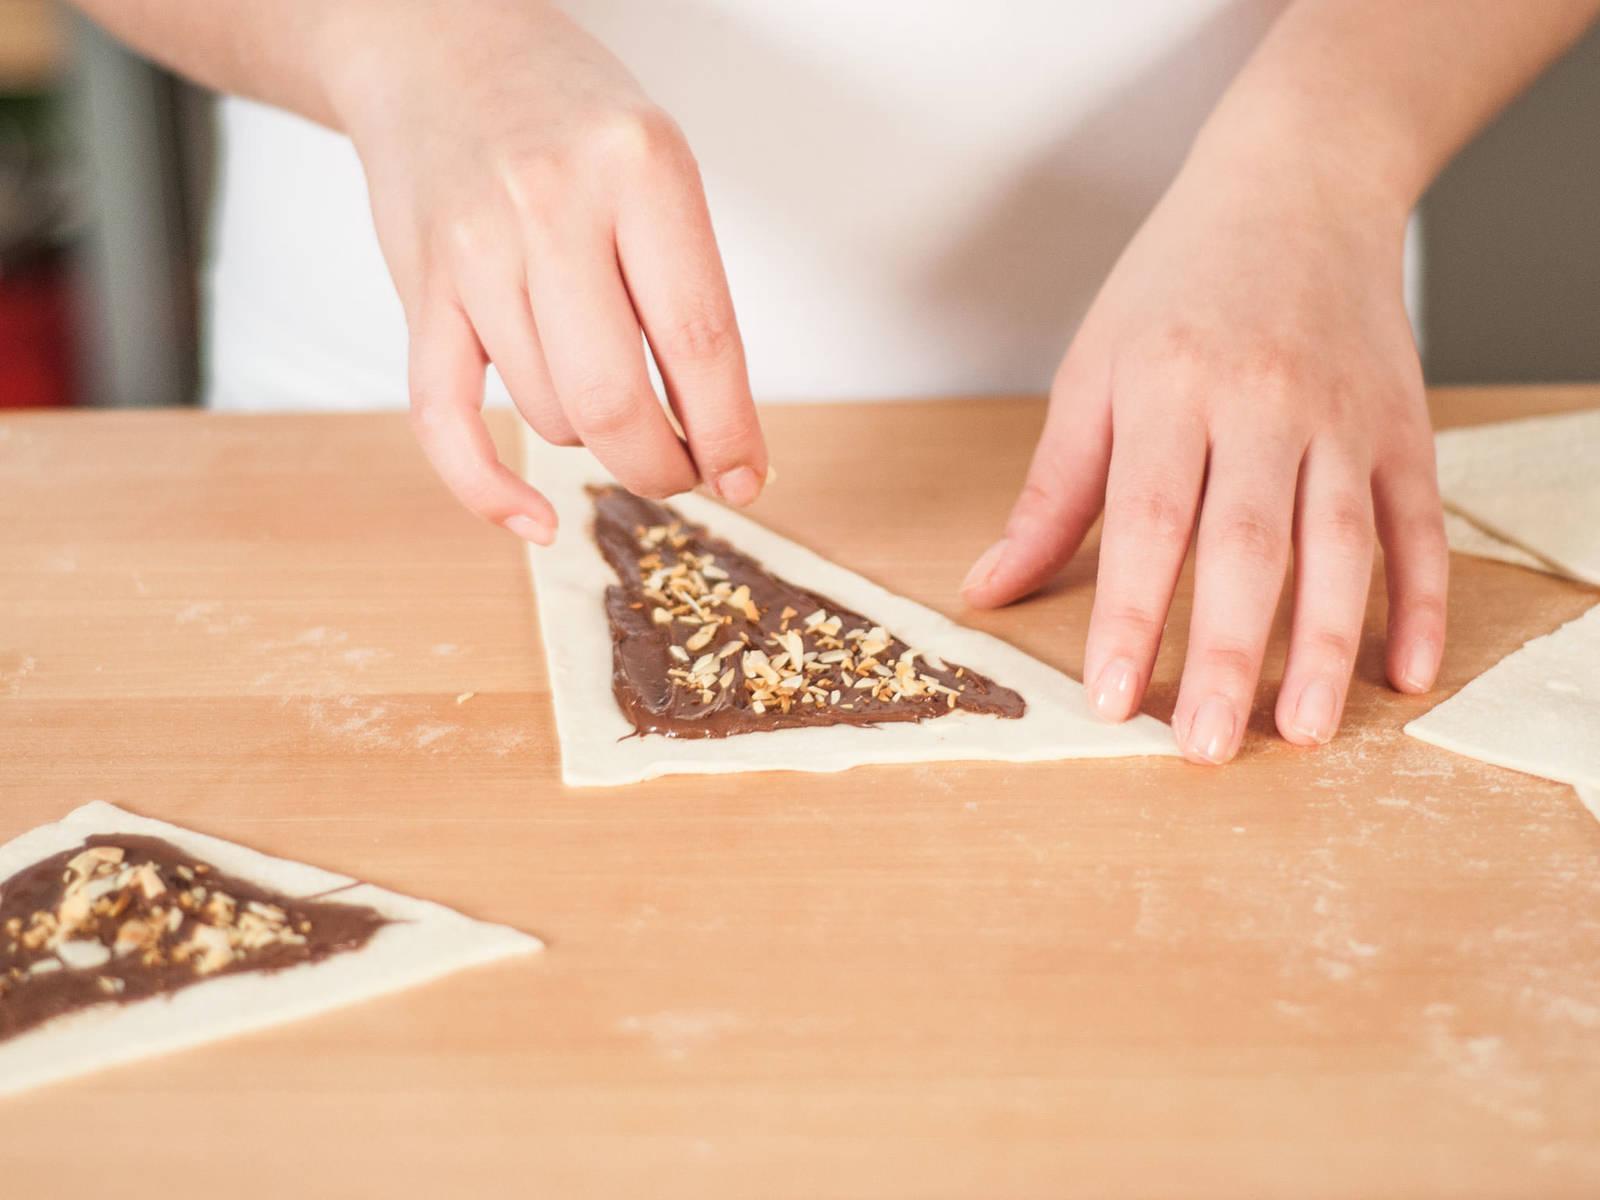 Sprinkle almonds on top of hazelnut spread.